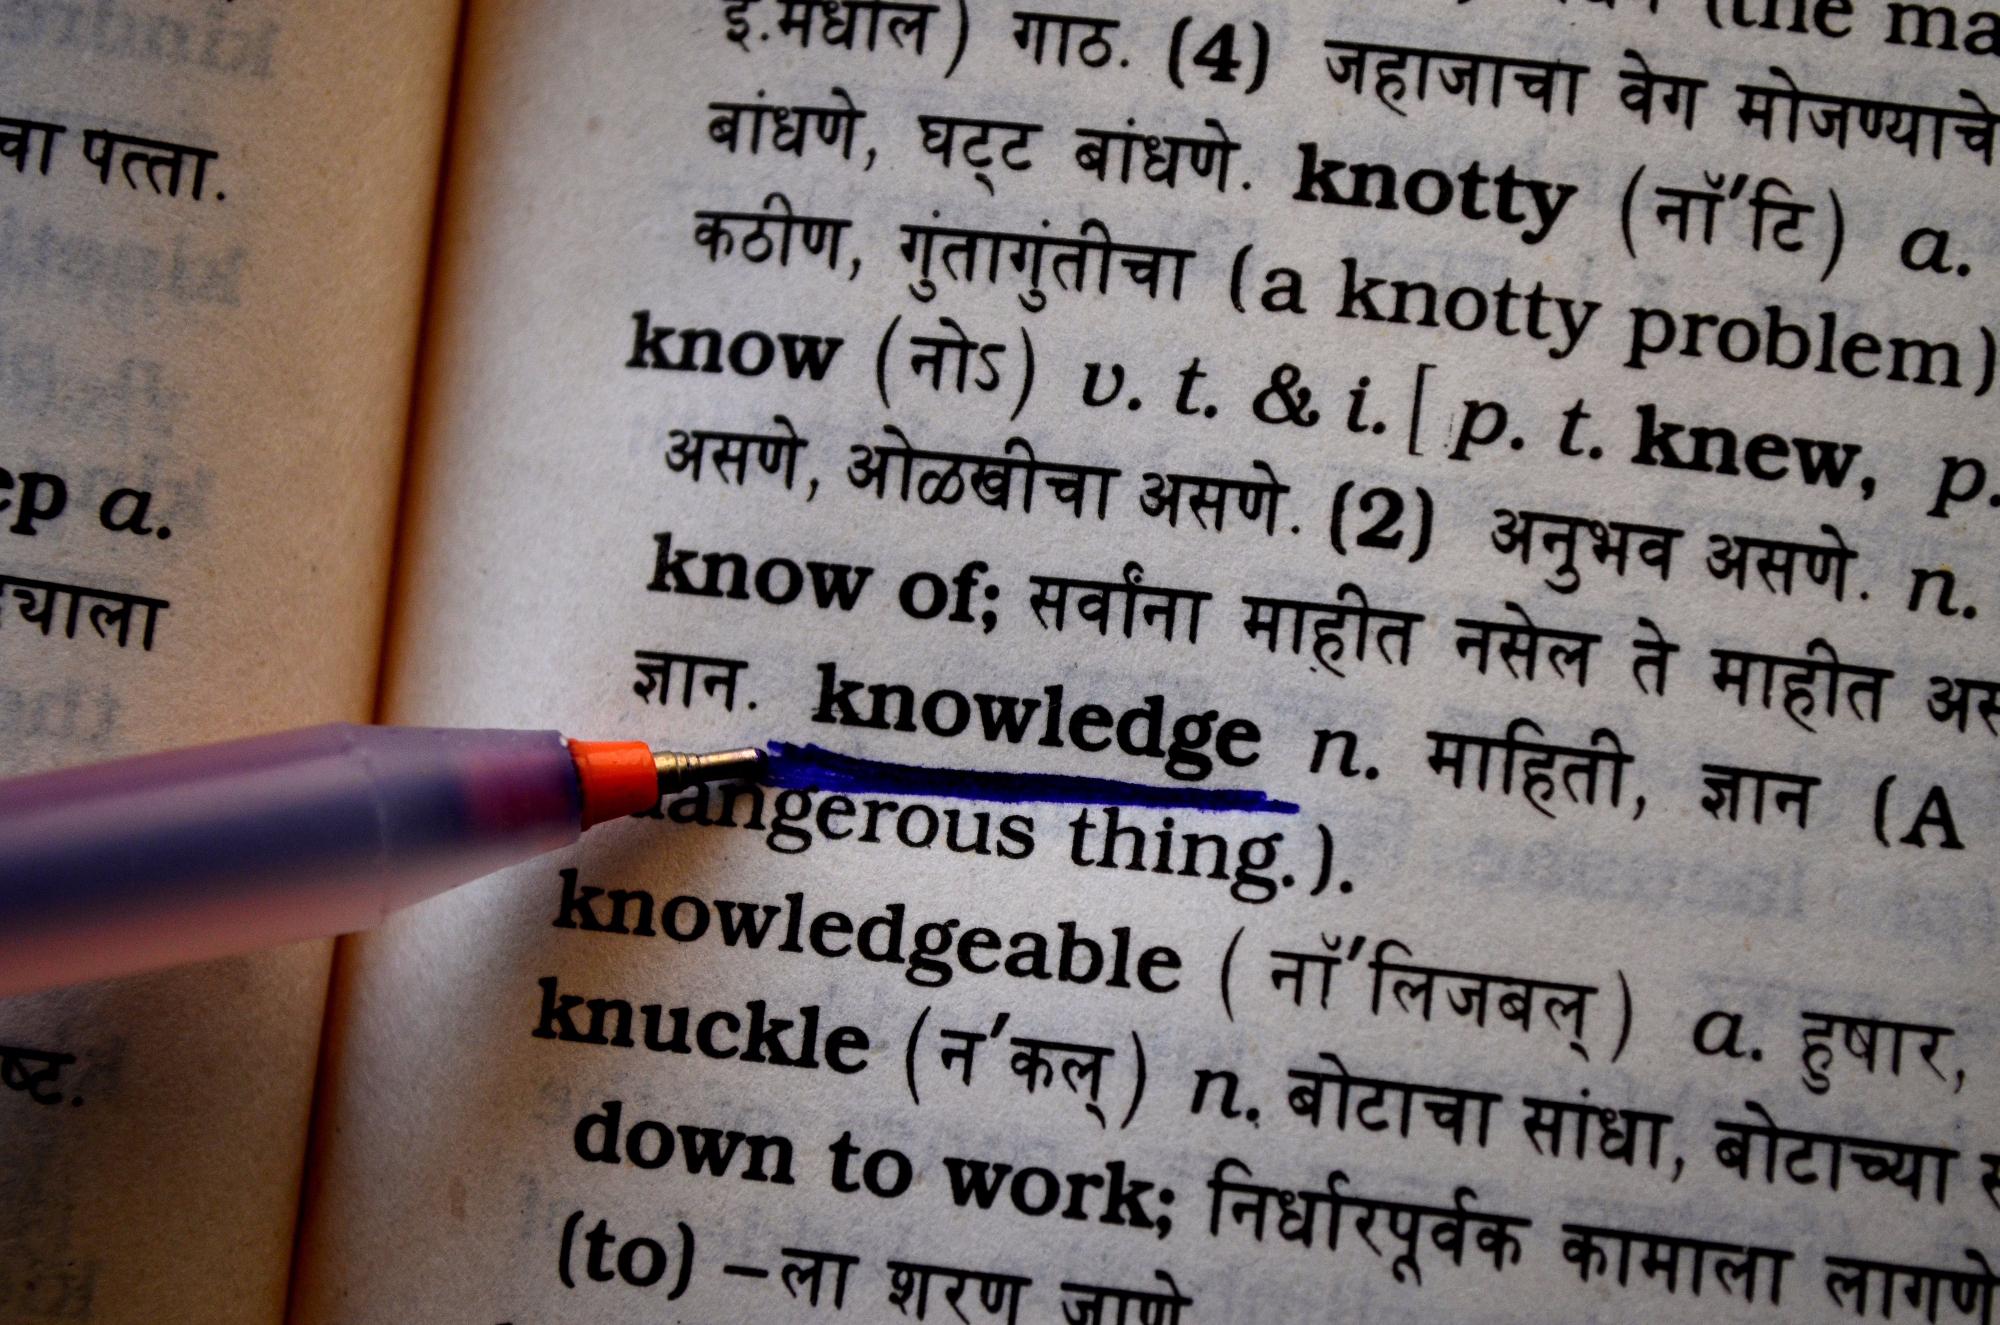 knowledge-390287